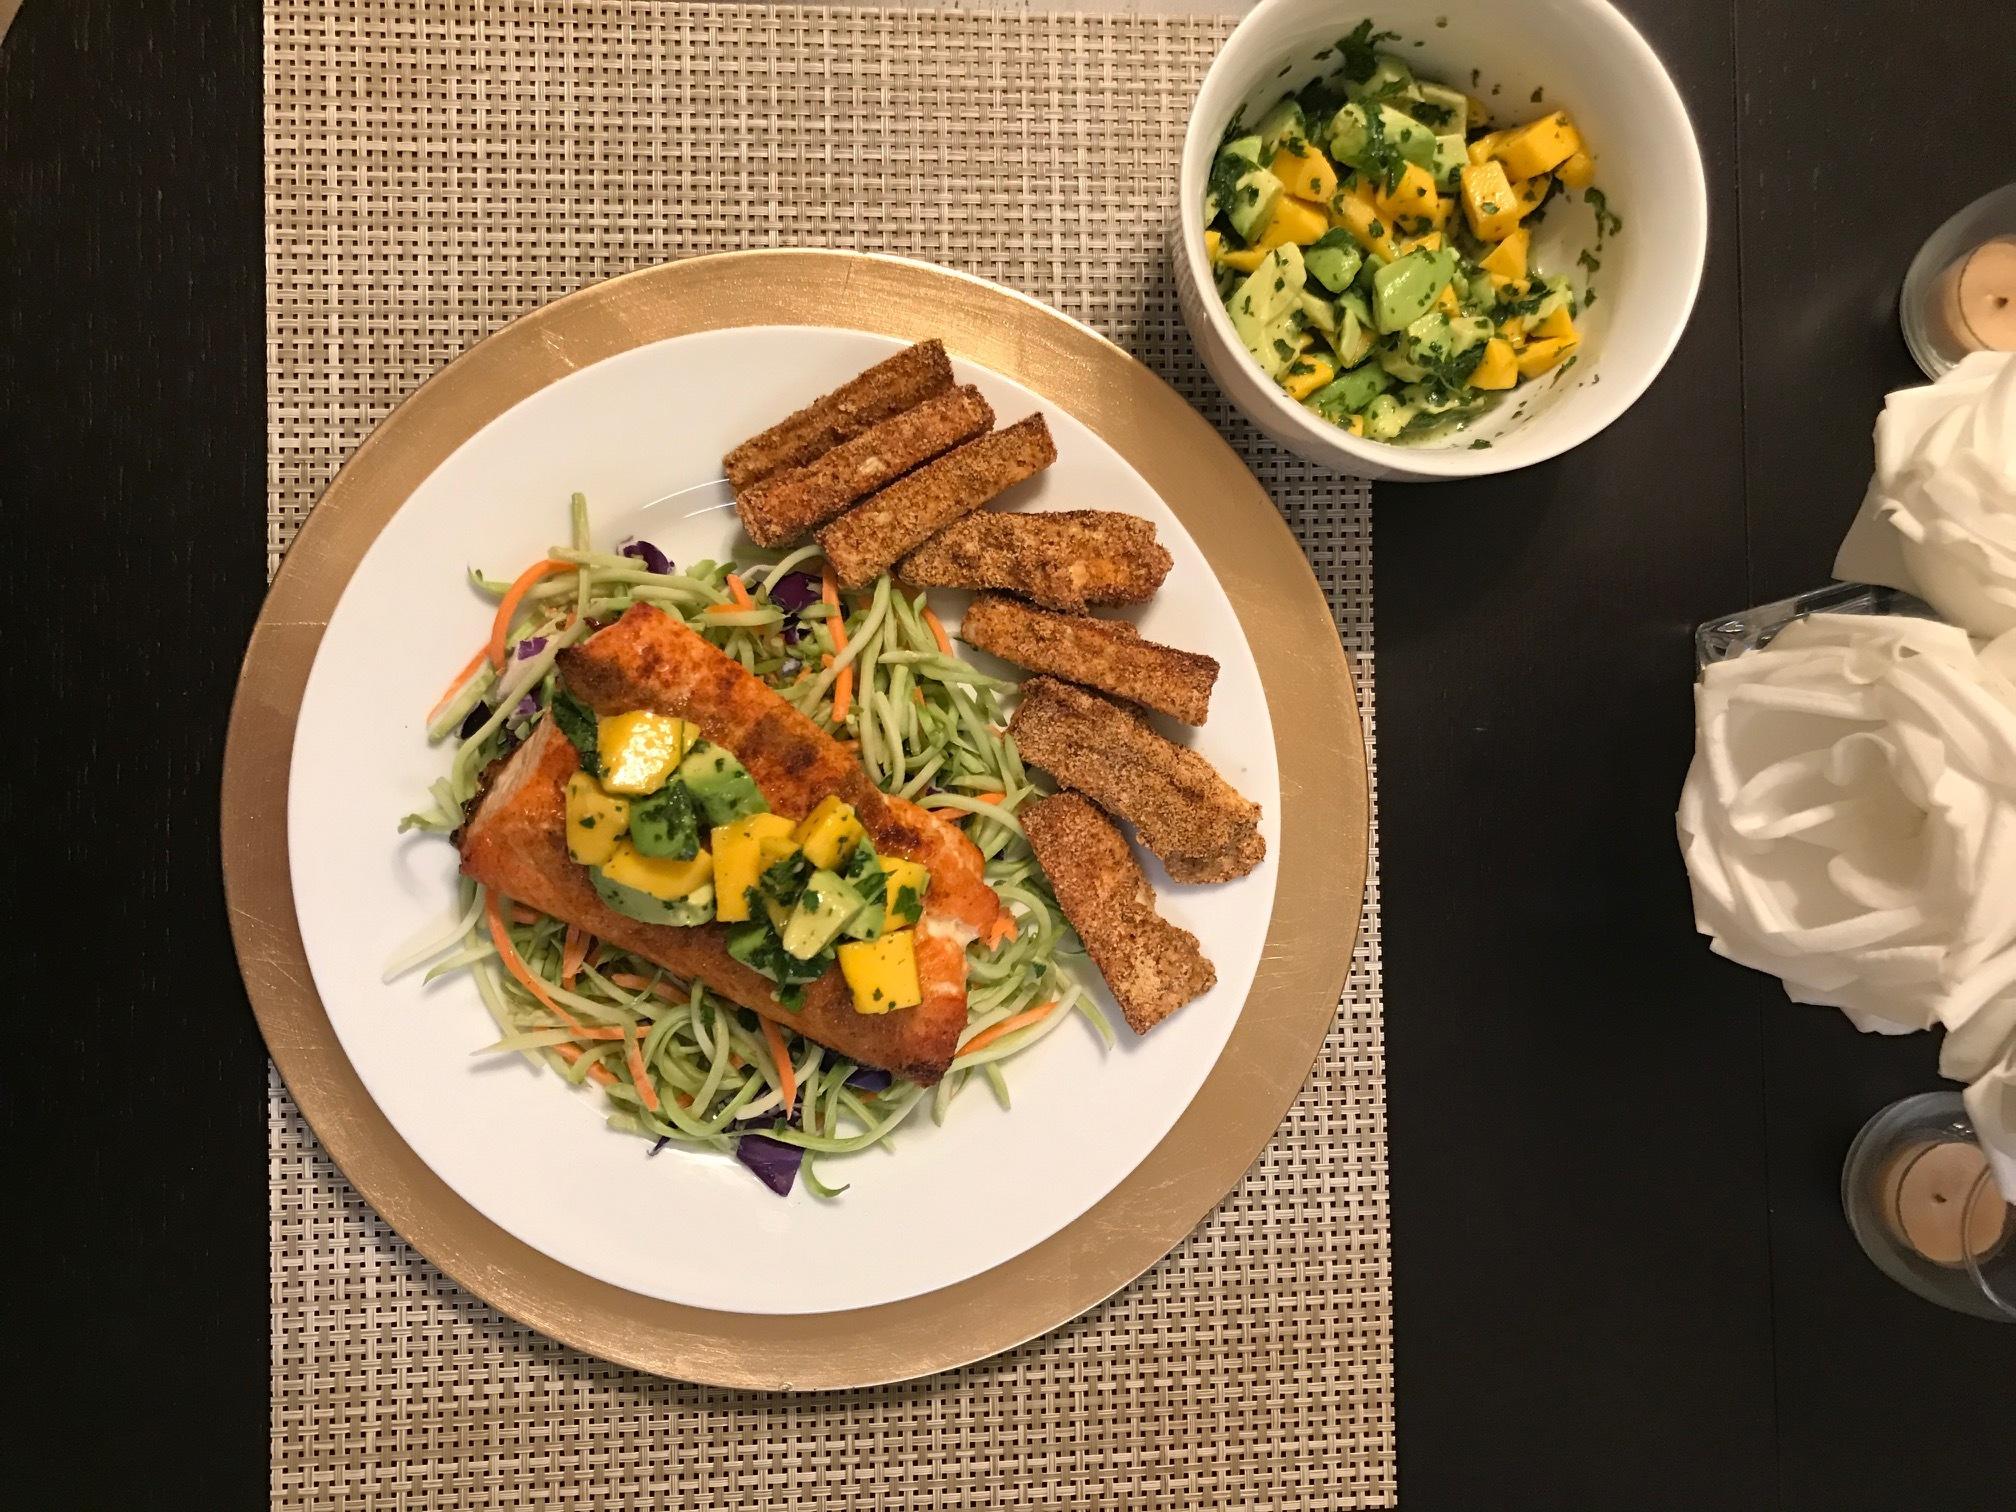 Baked Salmon with Avocado Mango Salsa - Paleo & Whole 30